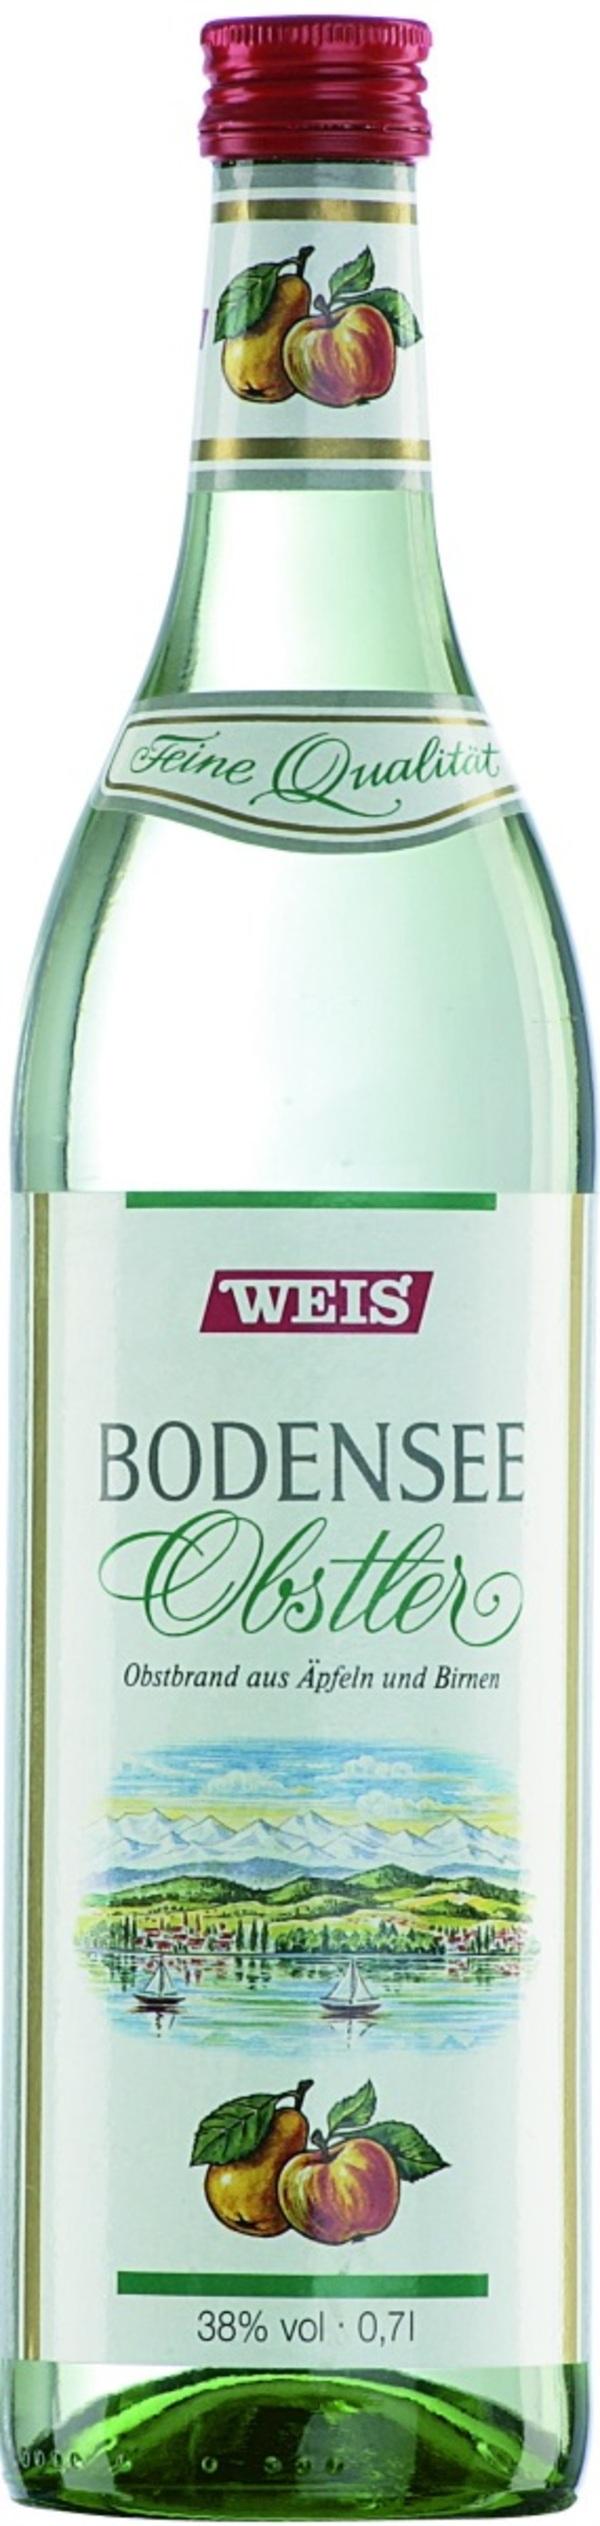 Weis Bodensee Obstler 0,7 ltr